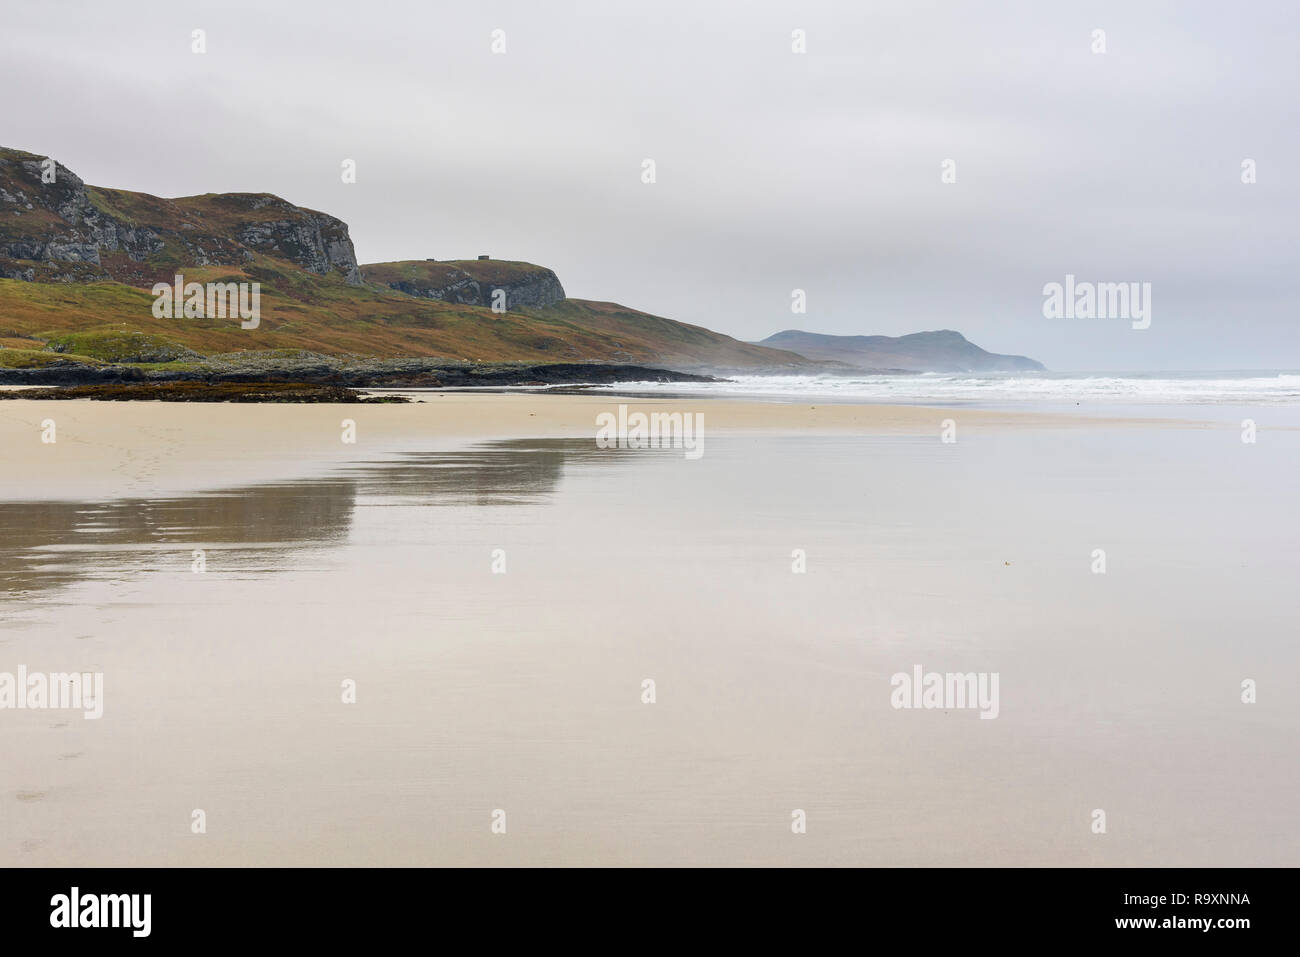 Machir Bay, Traigh Mhachir beach, Rhinns of Islay, Inner Hebrides, Argyll & Bute, Scotland - Stock Image